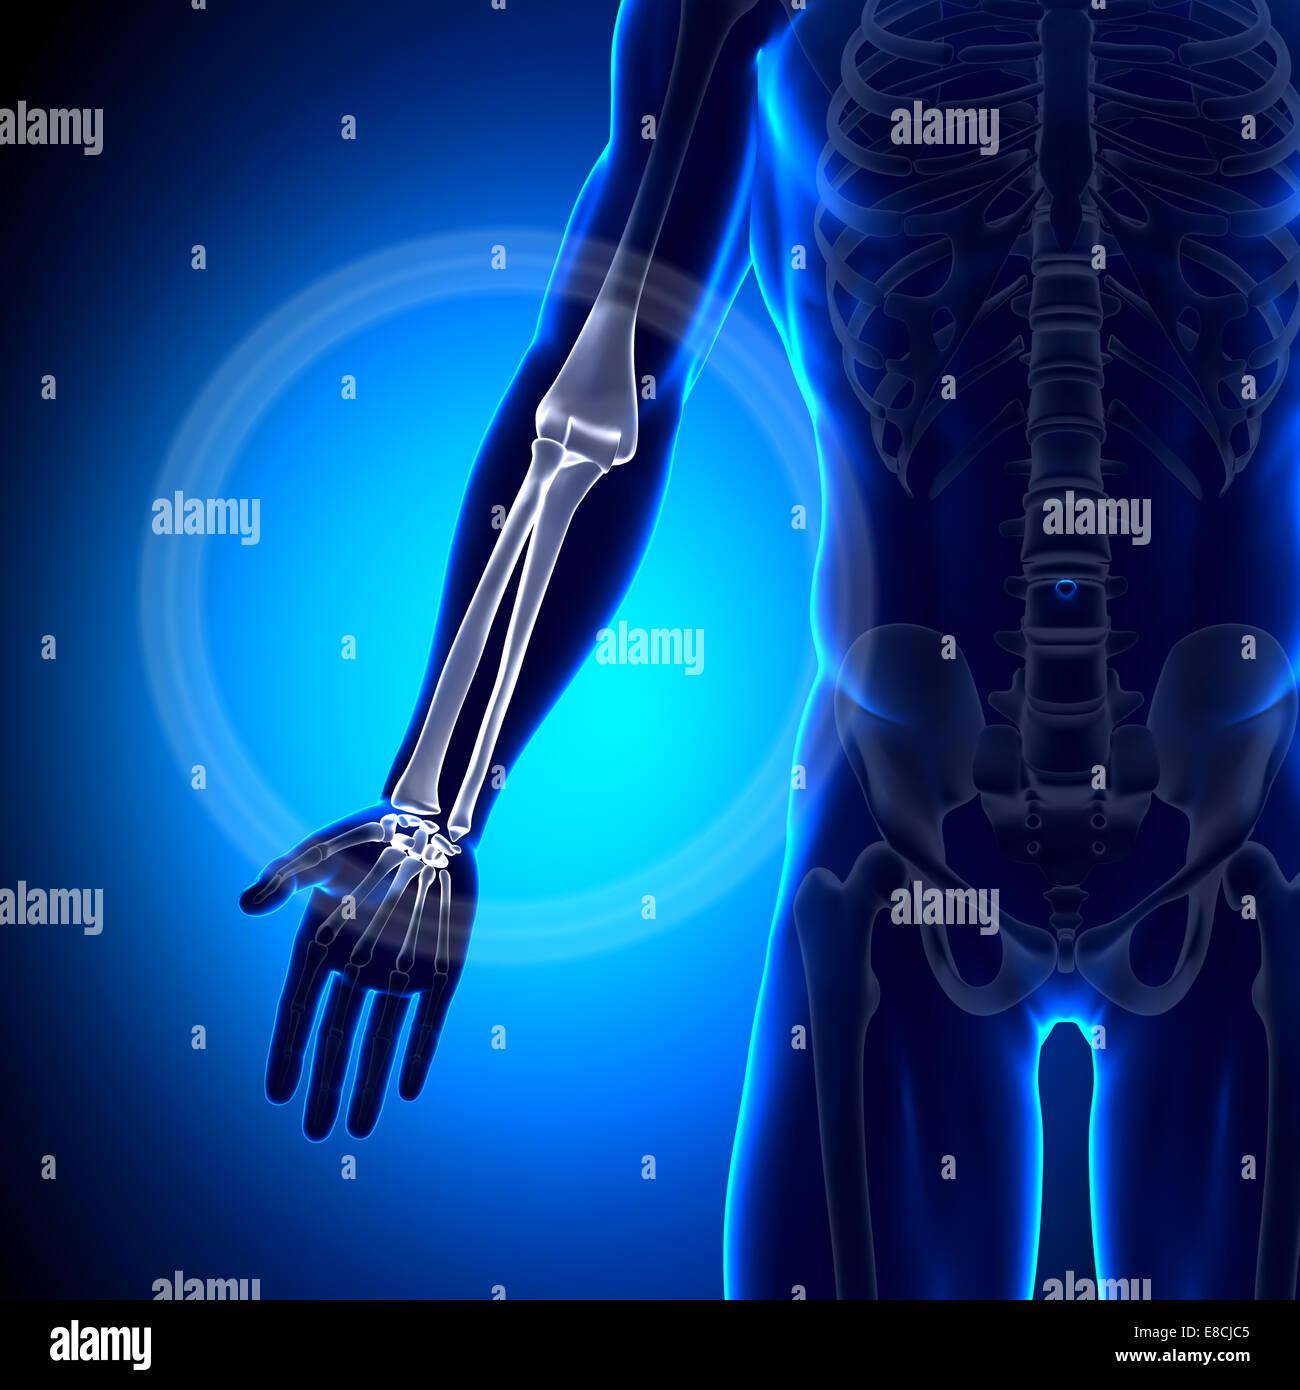 Radius / Ulna - Anatomy Bones Stock Photo: 74036597 - Alamy